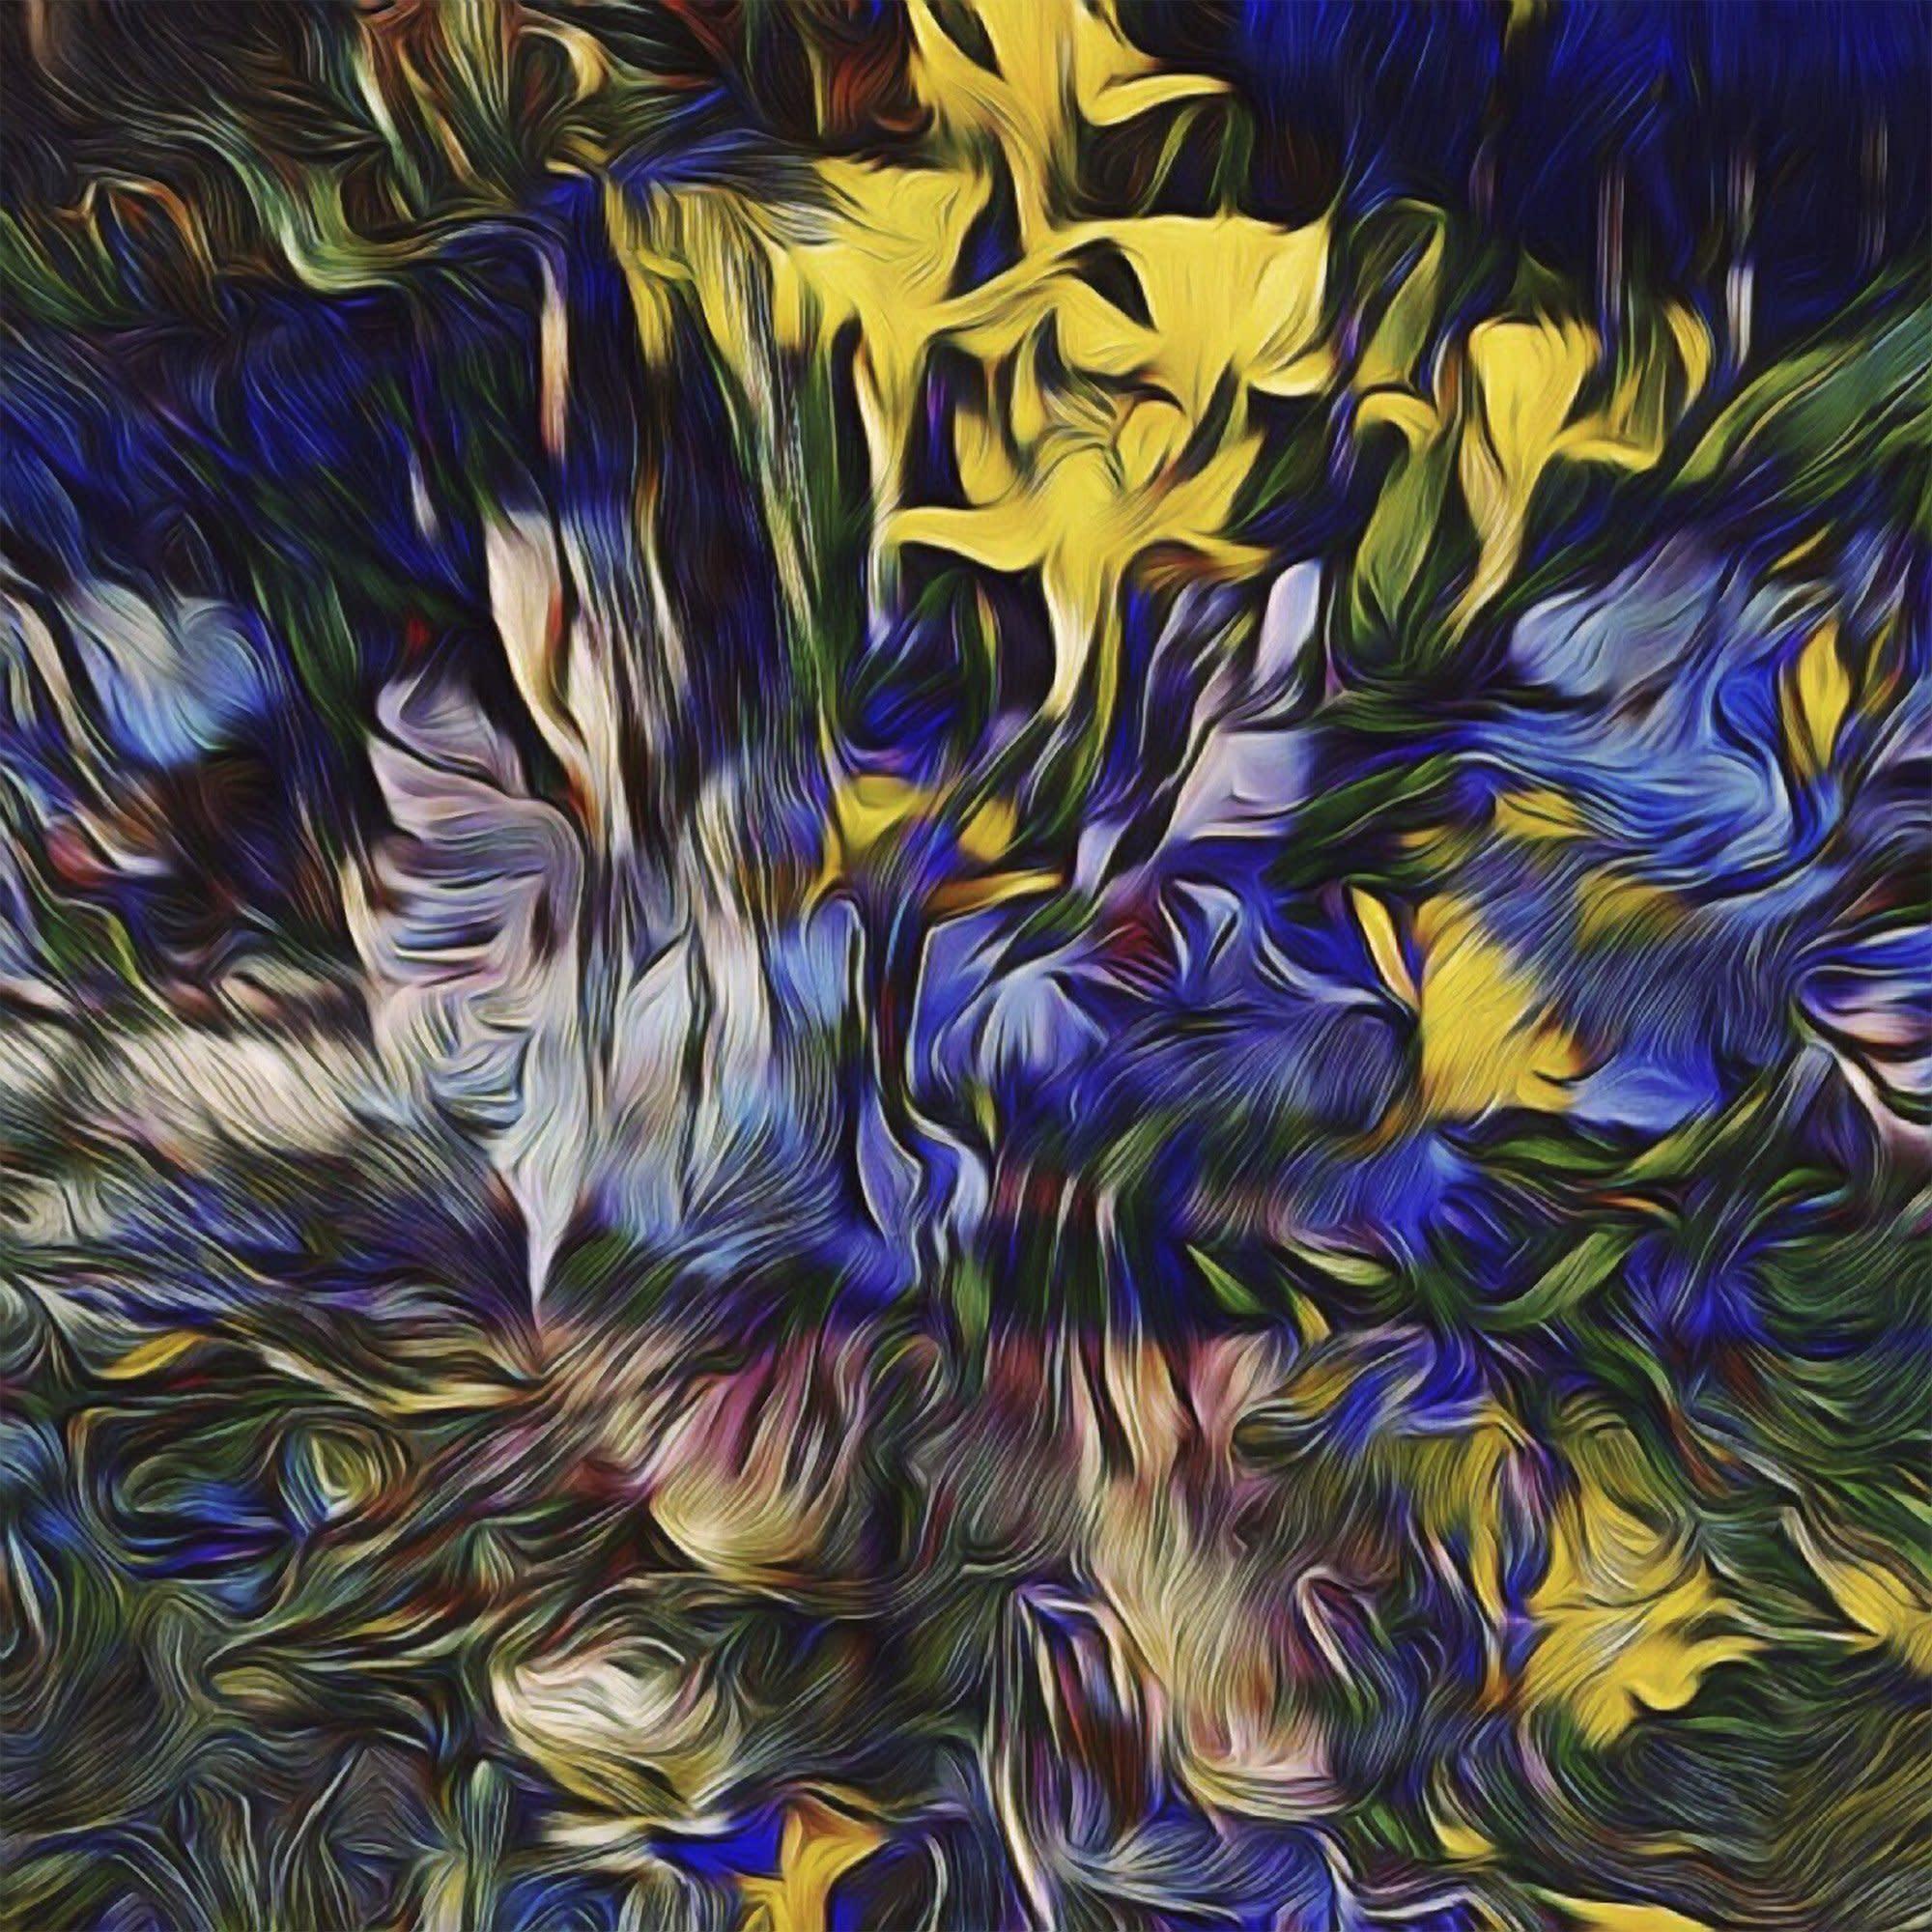 Spring flowers 2k 1 ic8moj